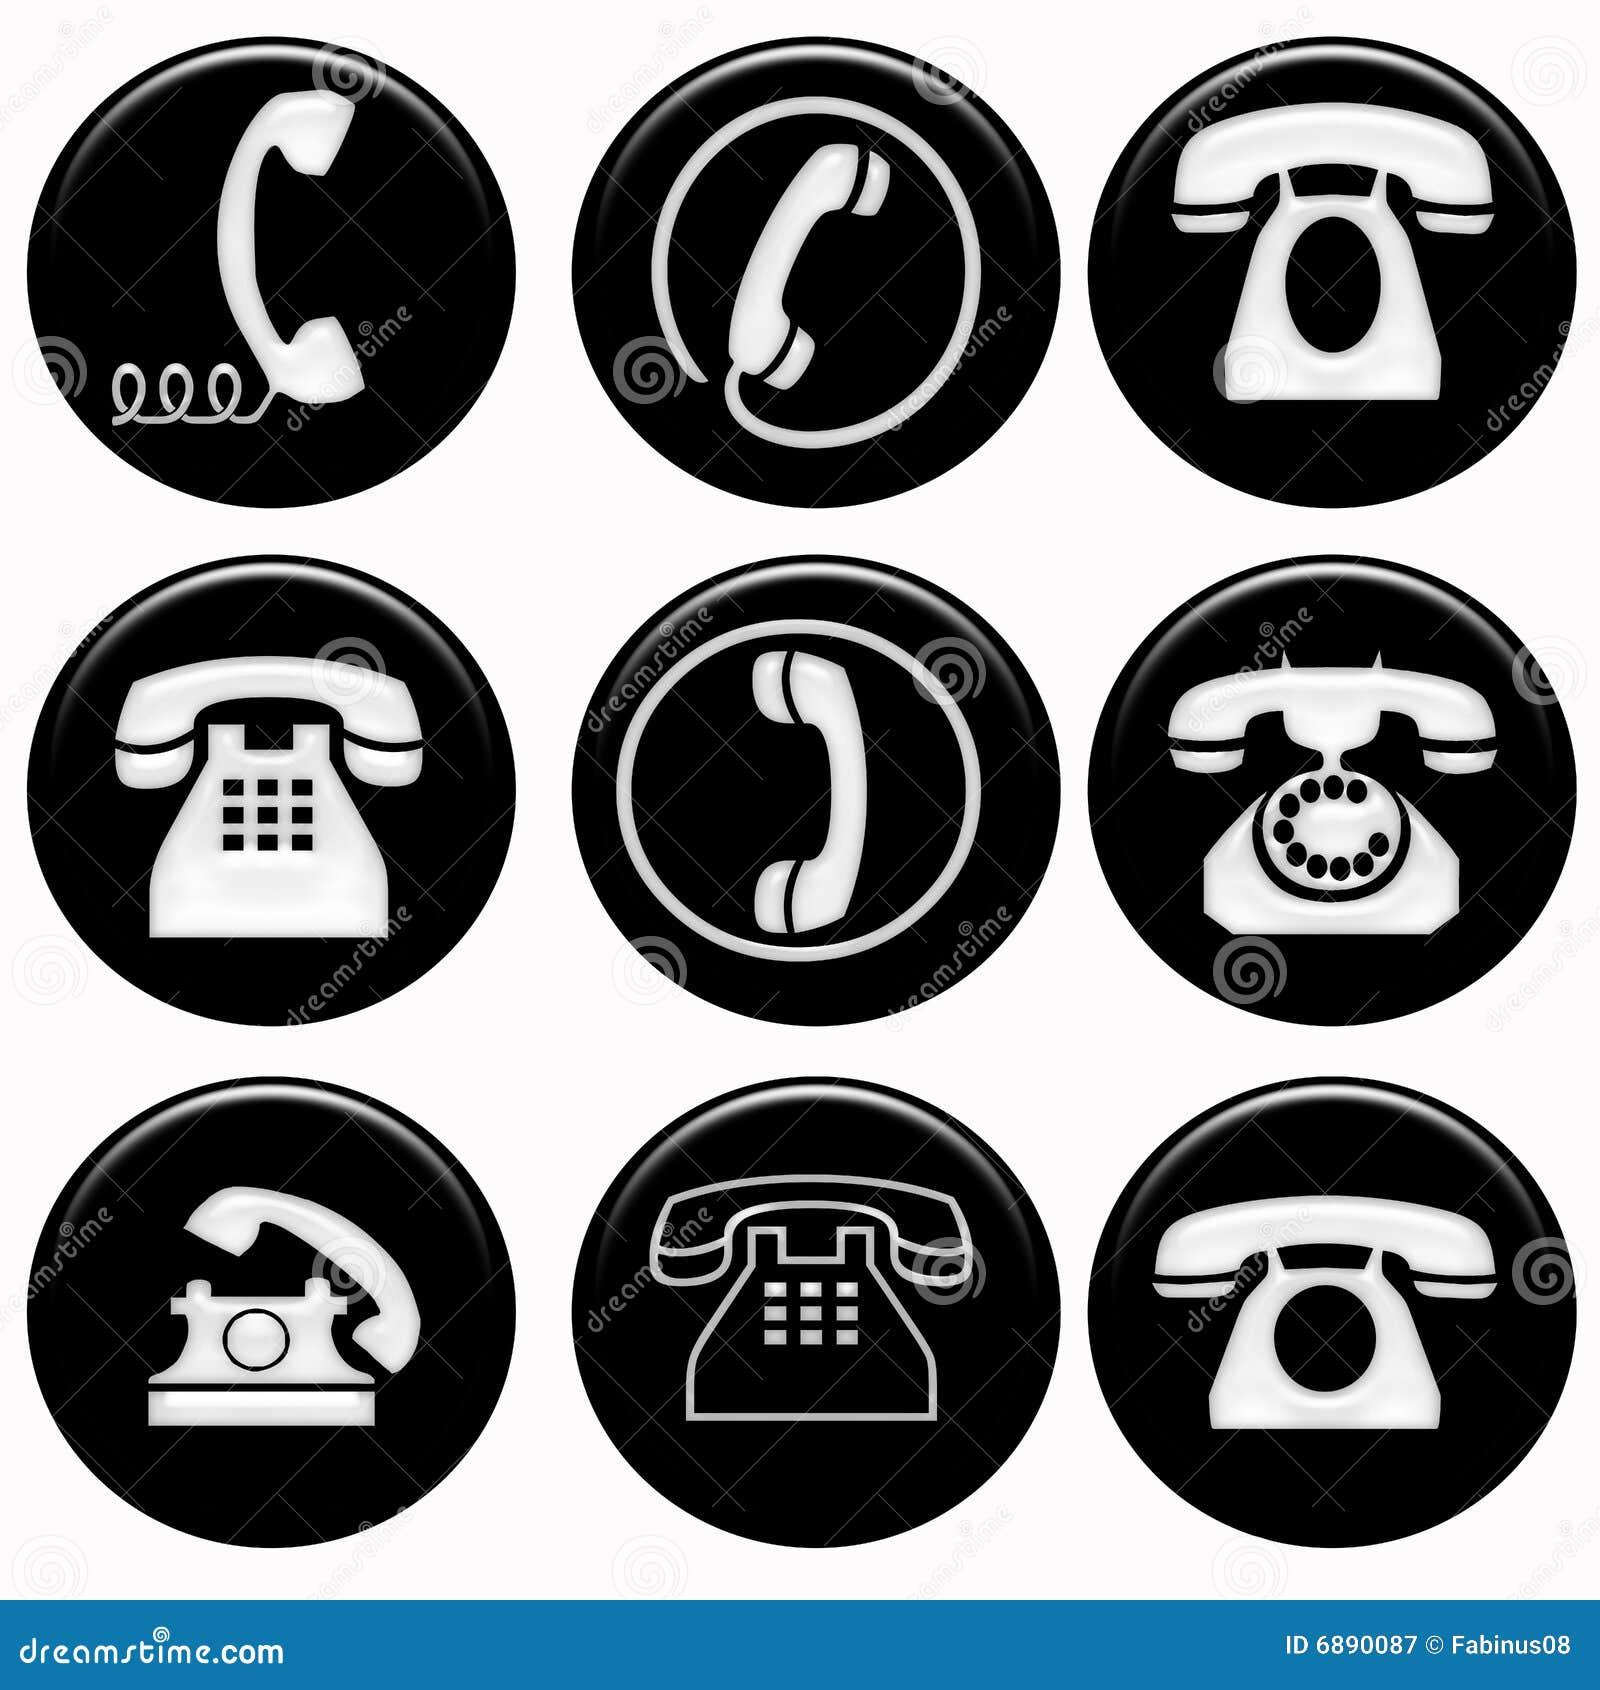 Phones Symbols Stock Illustration. Illustration Of